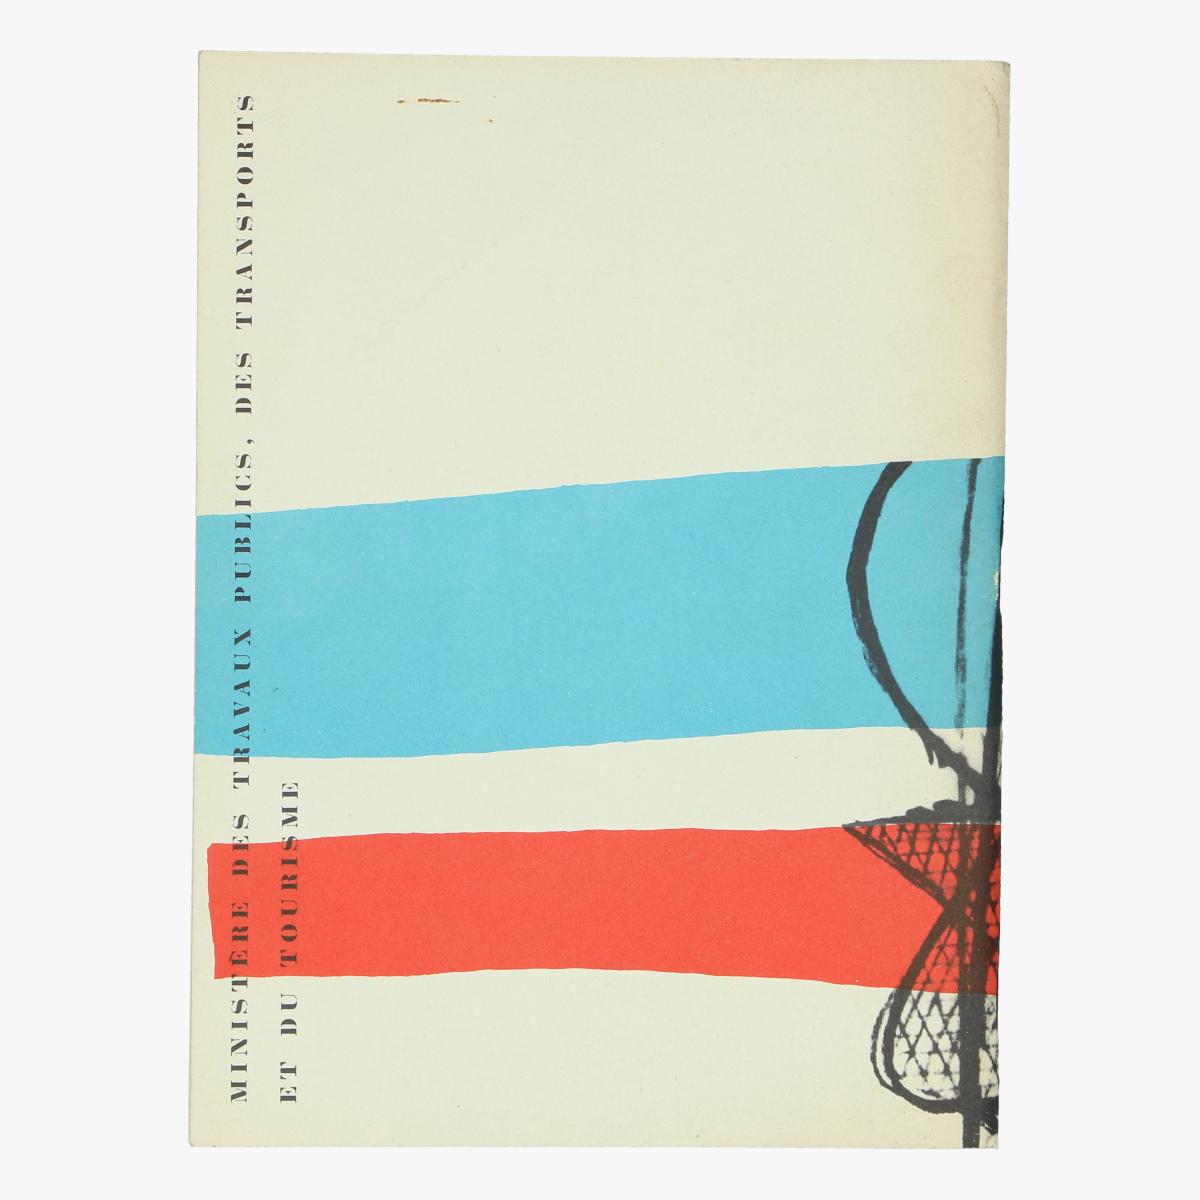 Afbeeldingen van expo 58 carnet de voyage en france / 1958 calendrier des manifestions